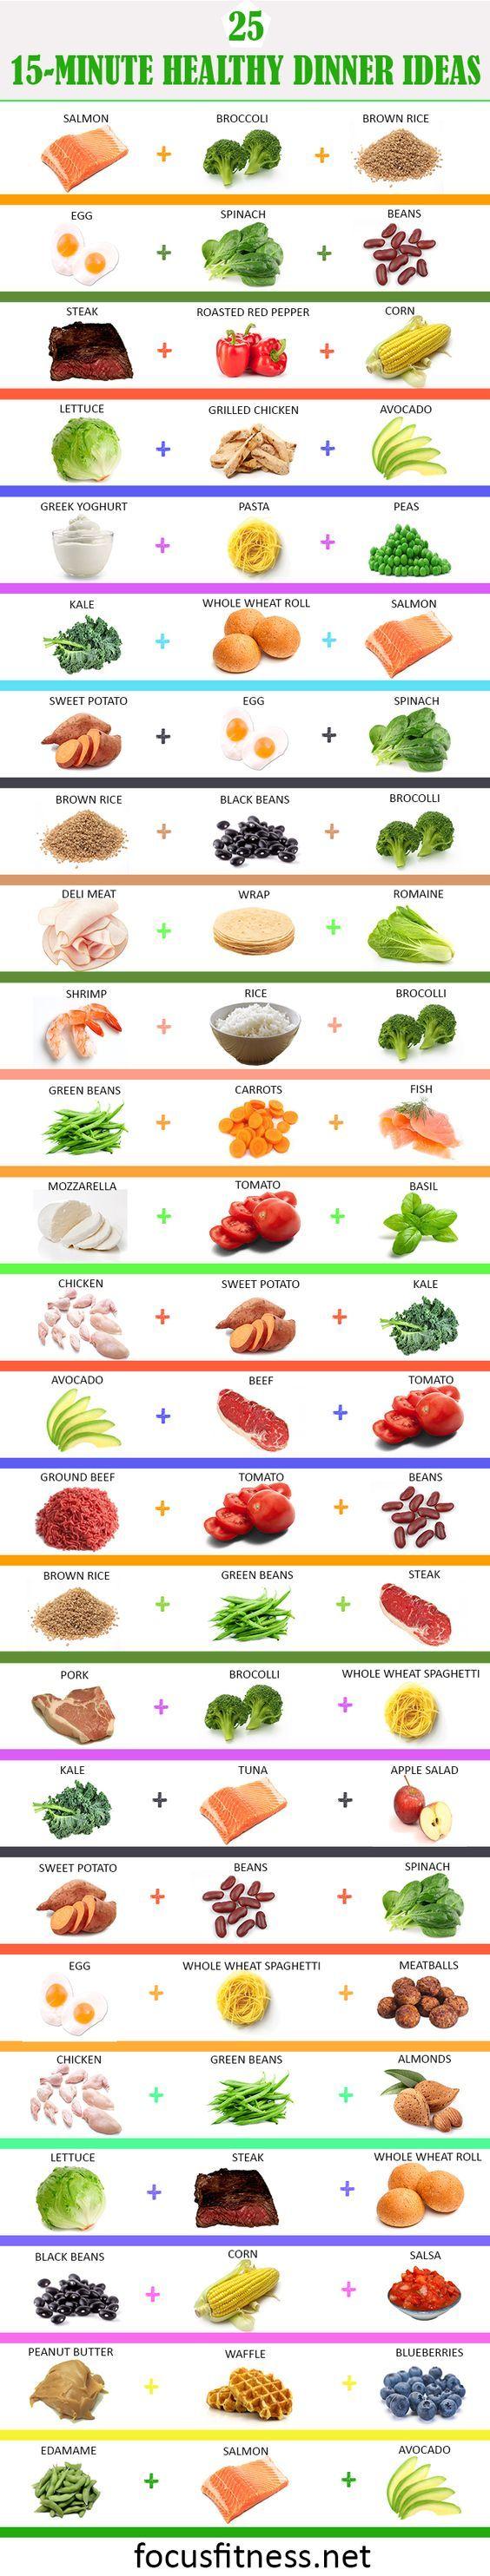 healthy dinner ideas http://focusfitness.net/25-15-minute-healthy-dinner-ideas-for-weight-loss/: